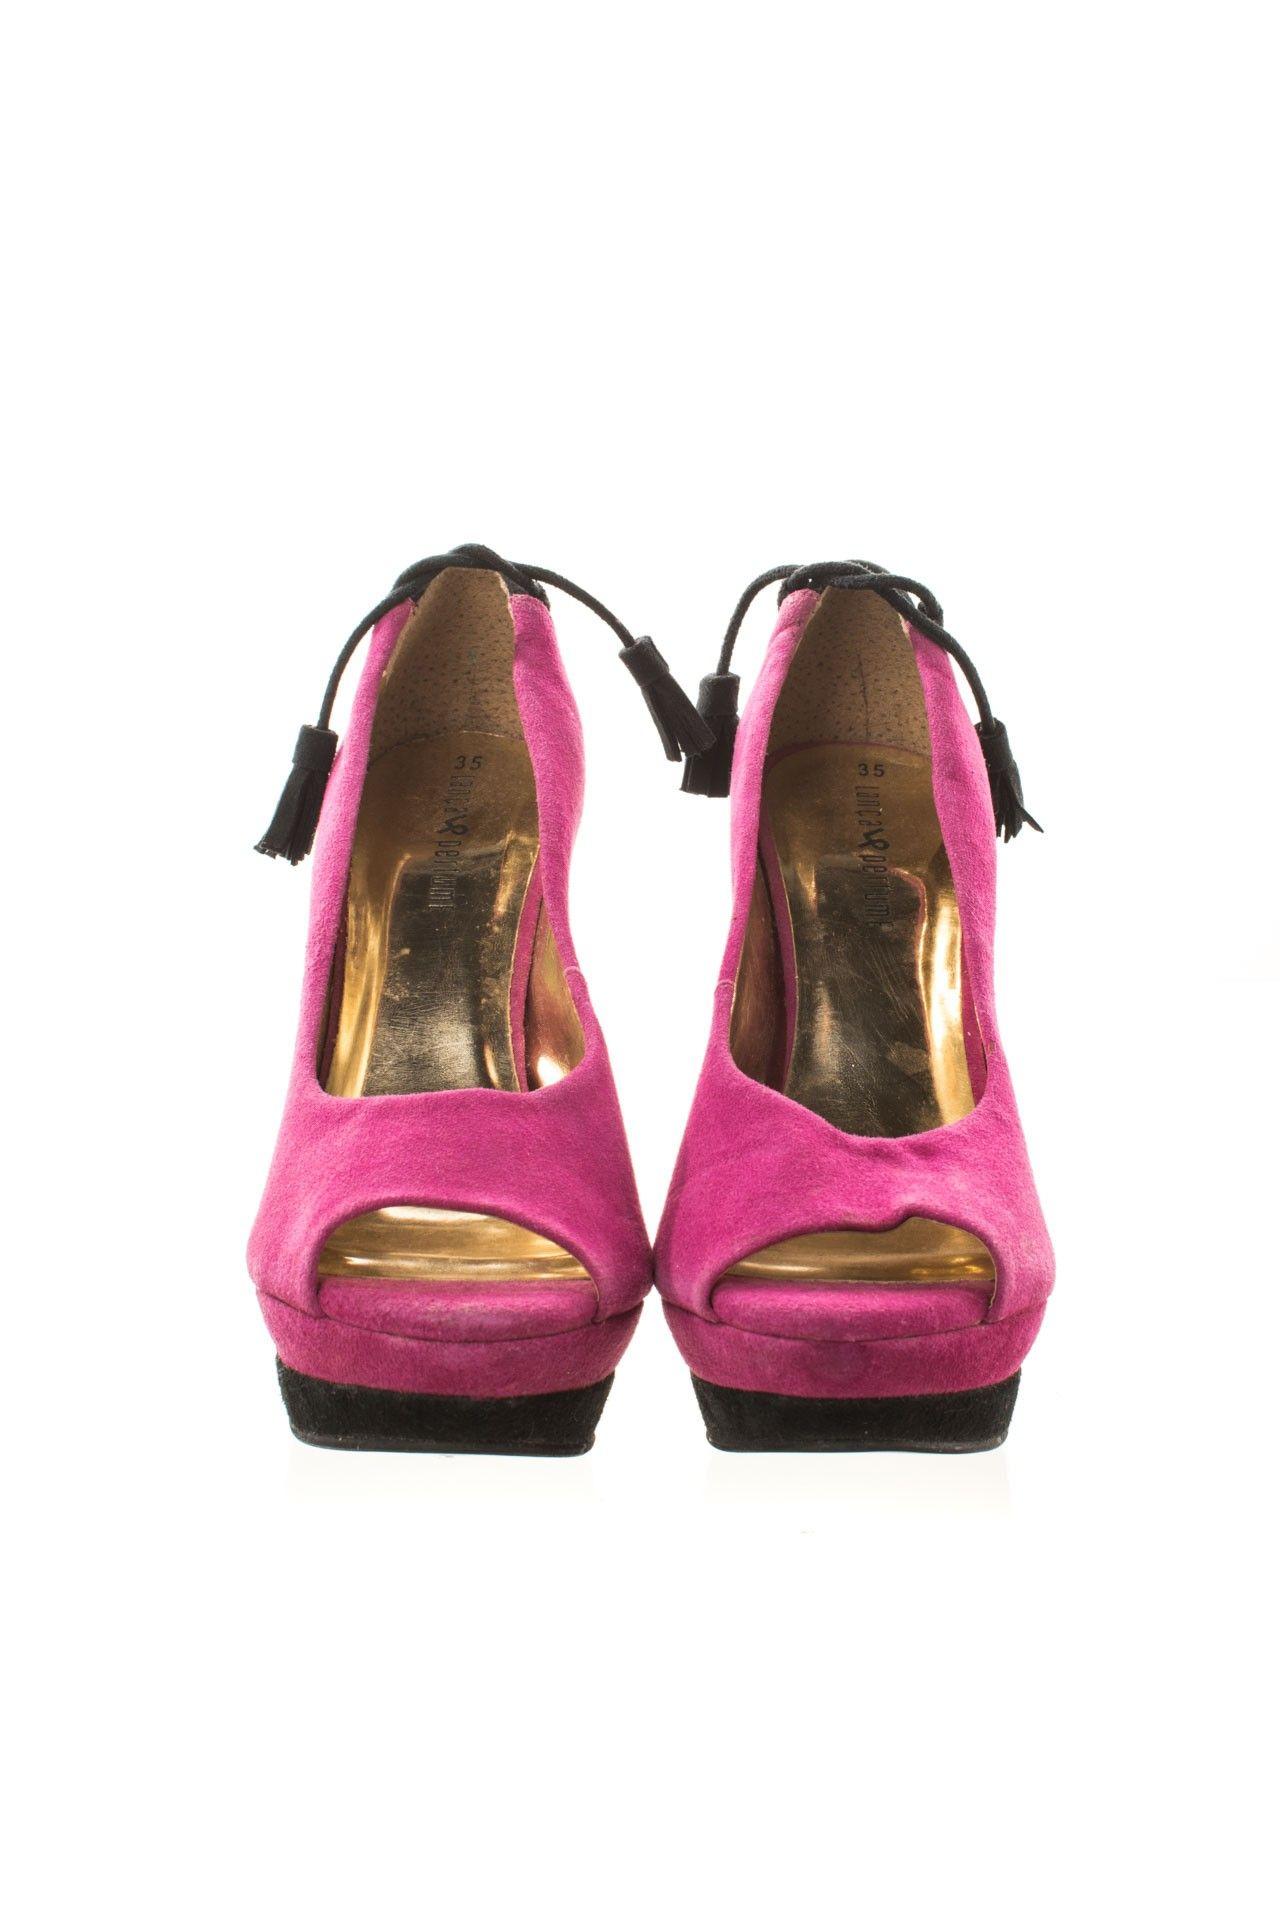 Lança Perfume - Sapato Rosa Salto - Foto 2